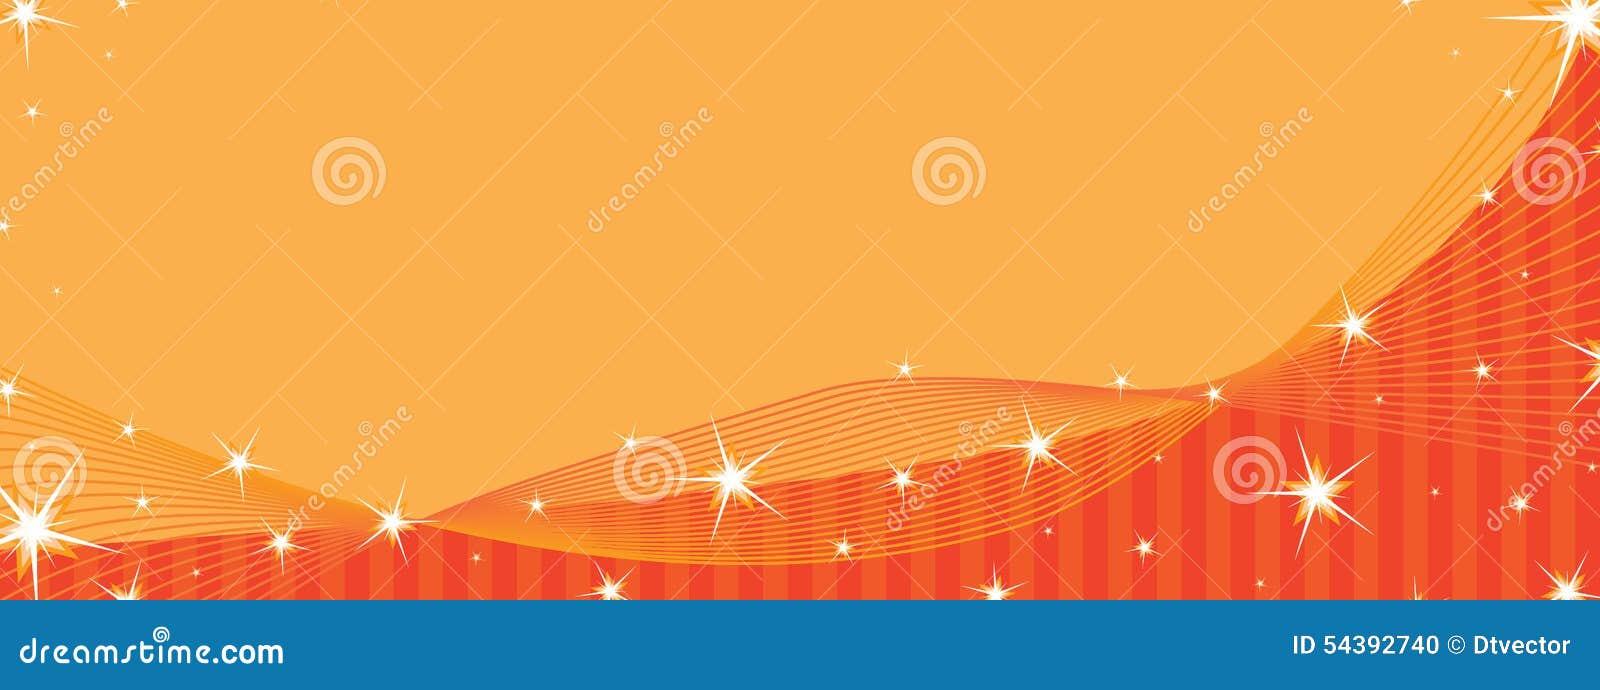 Star Orange Banner Space Stock Vector. Illustration Of